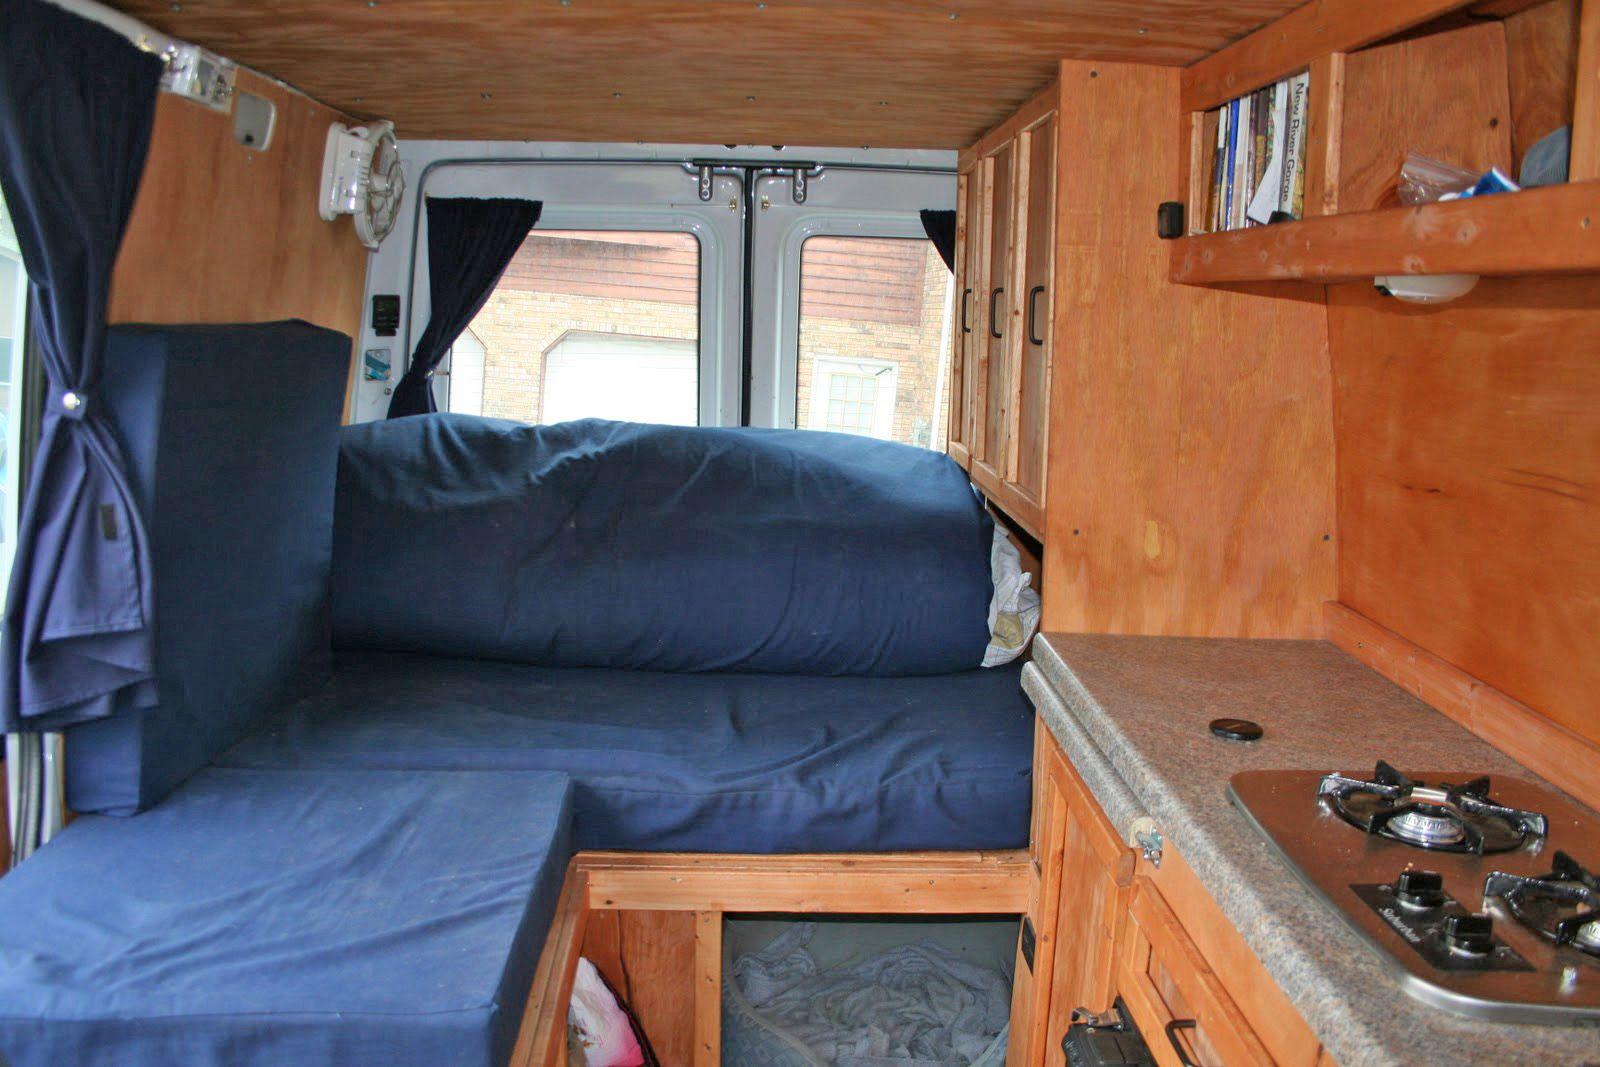 Diy rv interiors - Campervan Interior